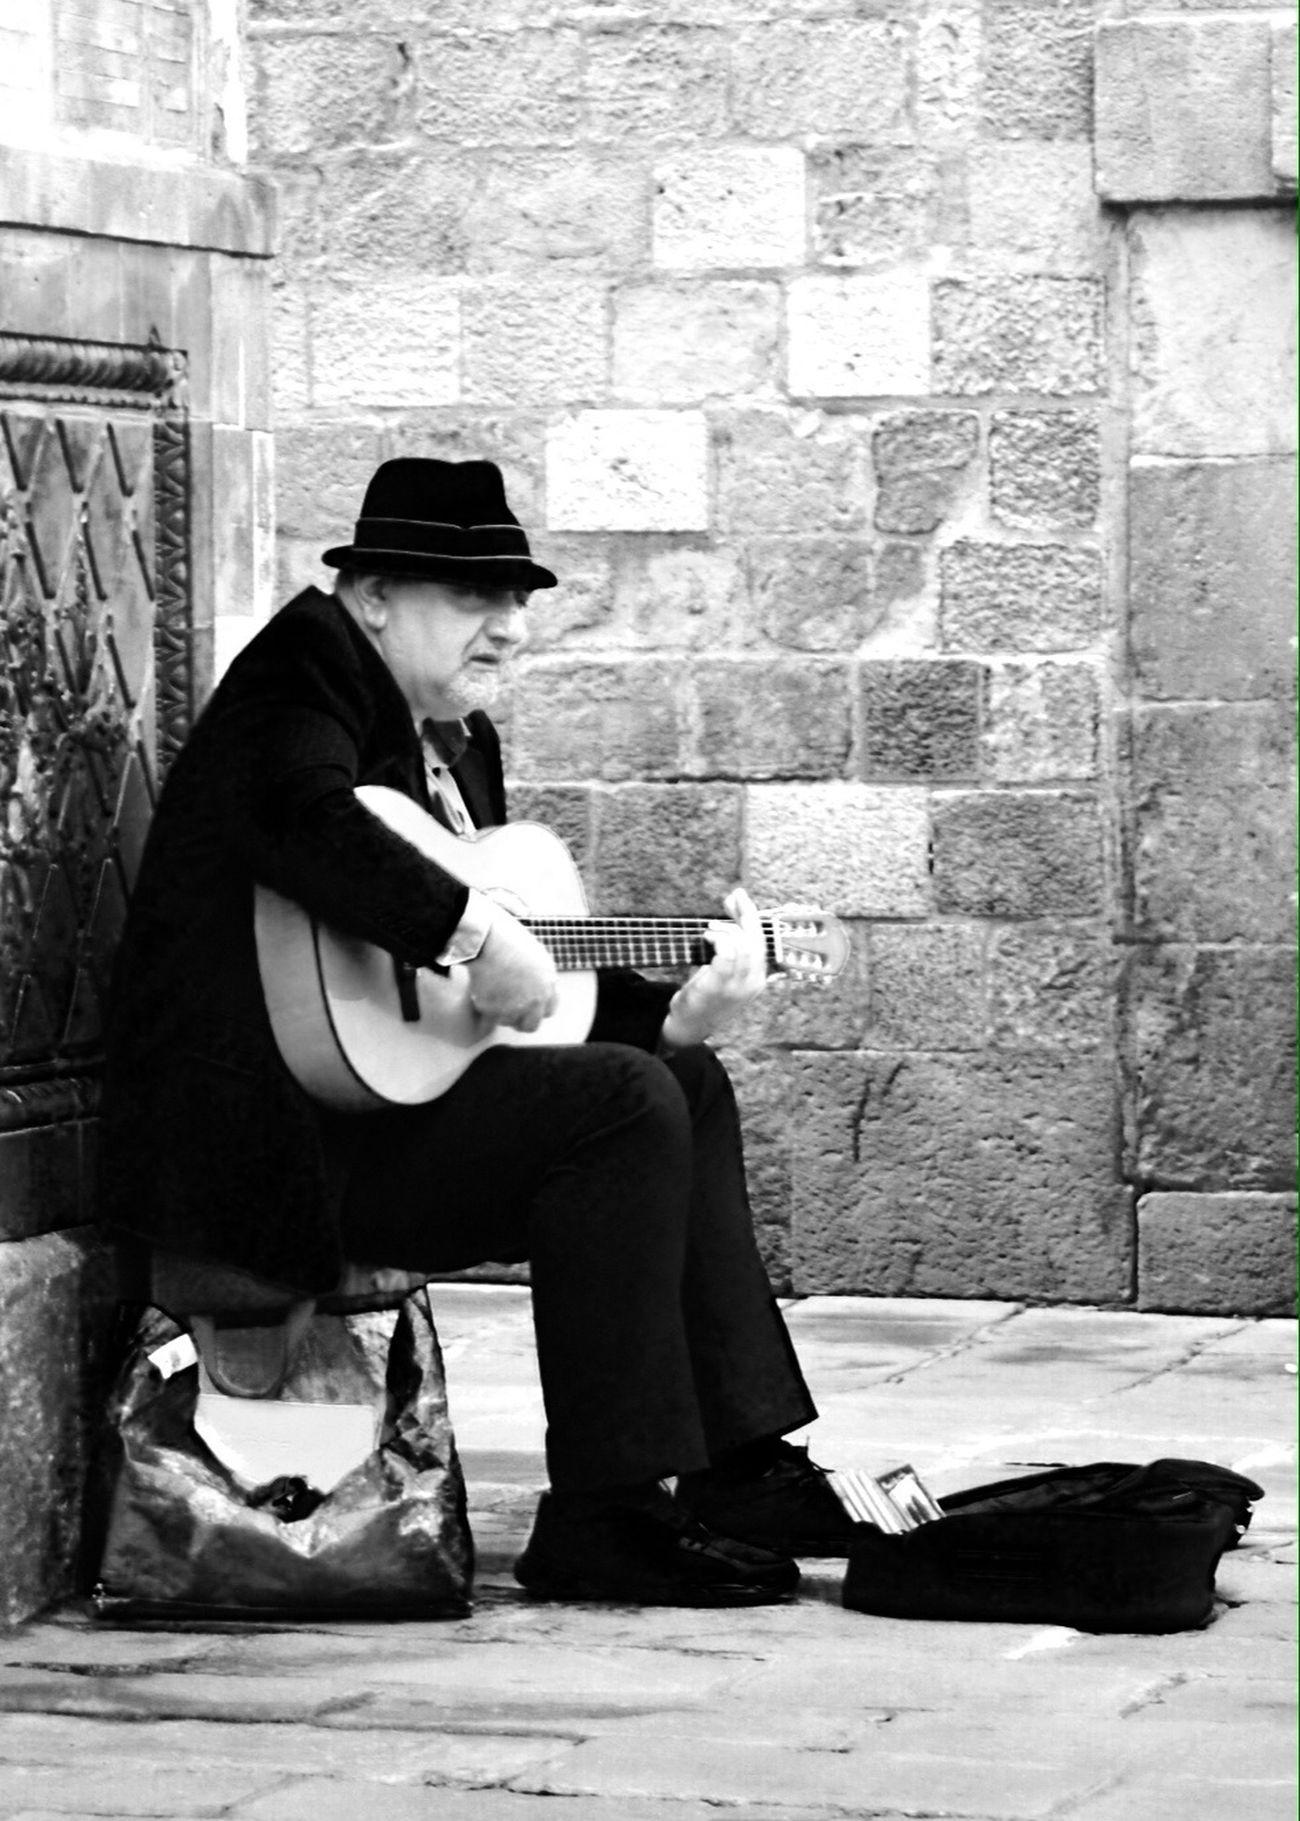 Street Musician Superb Mr. Cohen Streetphoto_bw